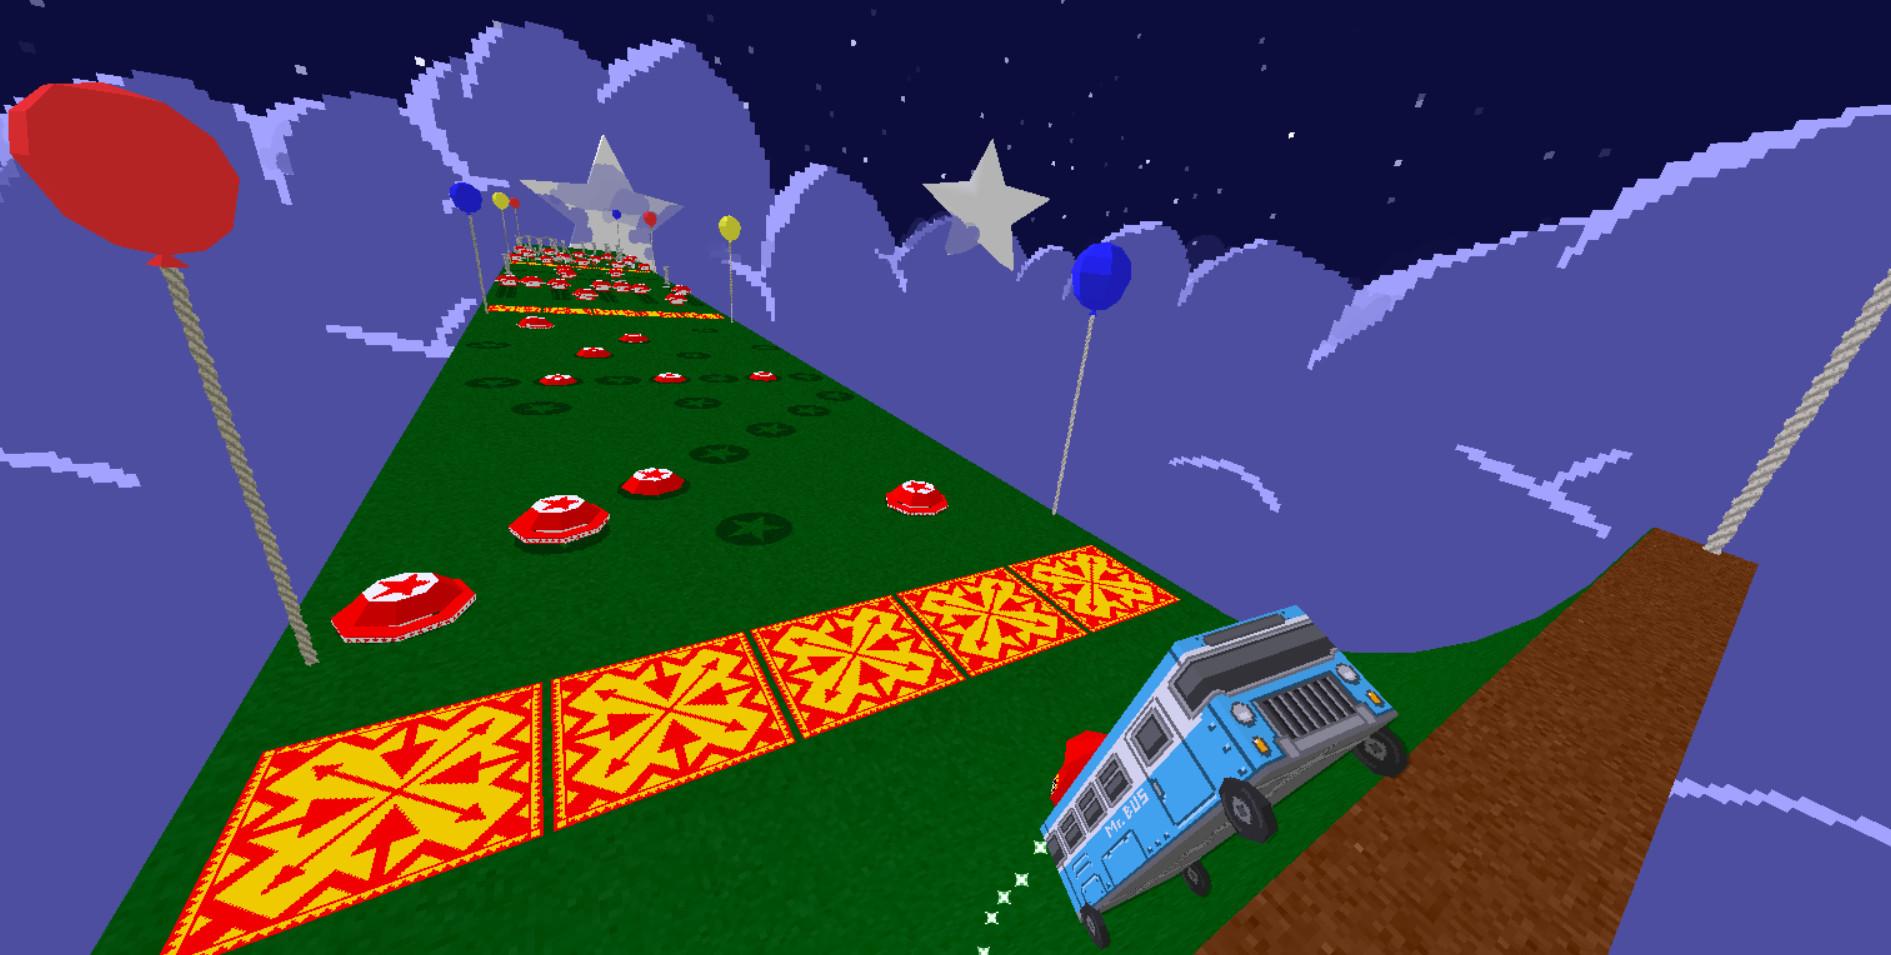 OmniBus Free Full Game Download Screenshot 2